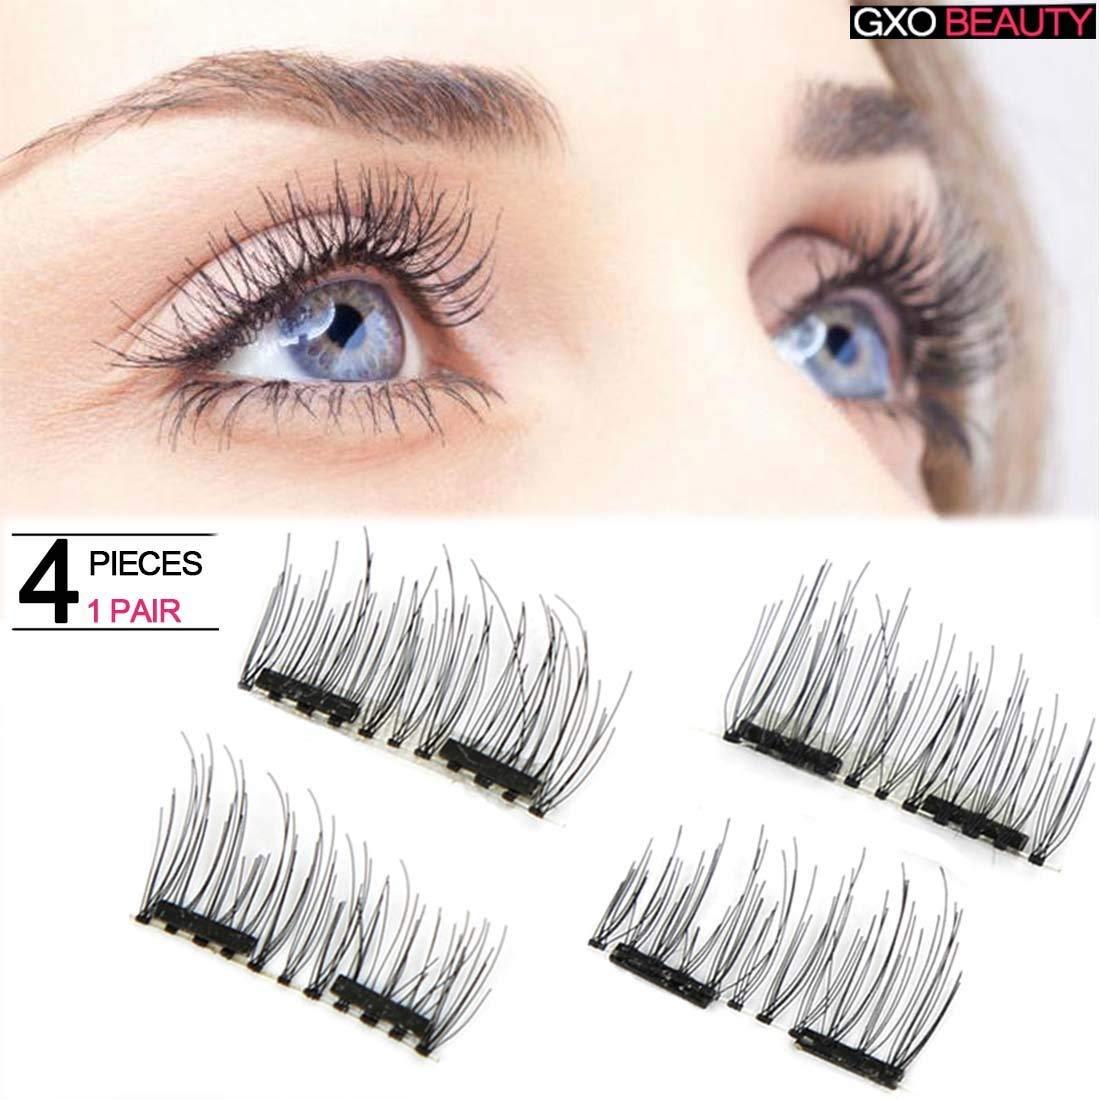 4eb3f384908 Get Quotations · Natural Double Magnetic Eyelashes False Magnetic Eyelashes  No Glue Convenient Soft Air Fake Eyelashes 3D Reusable